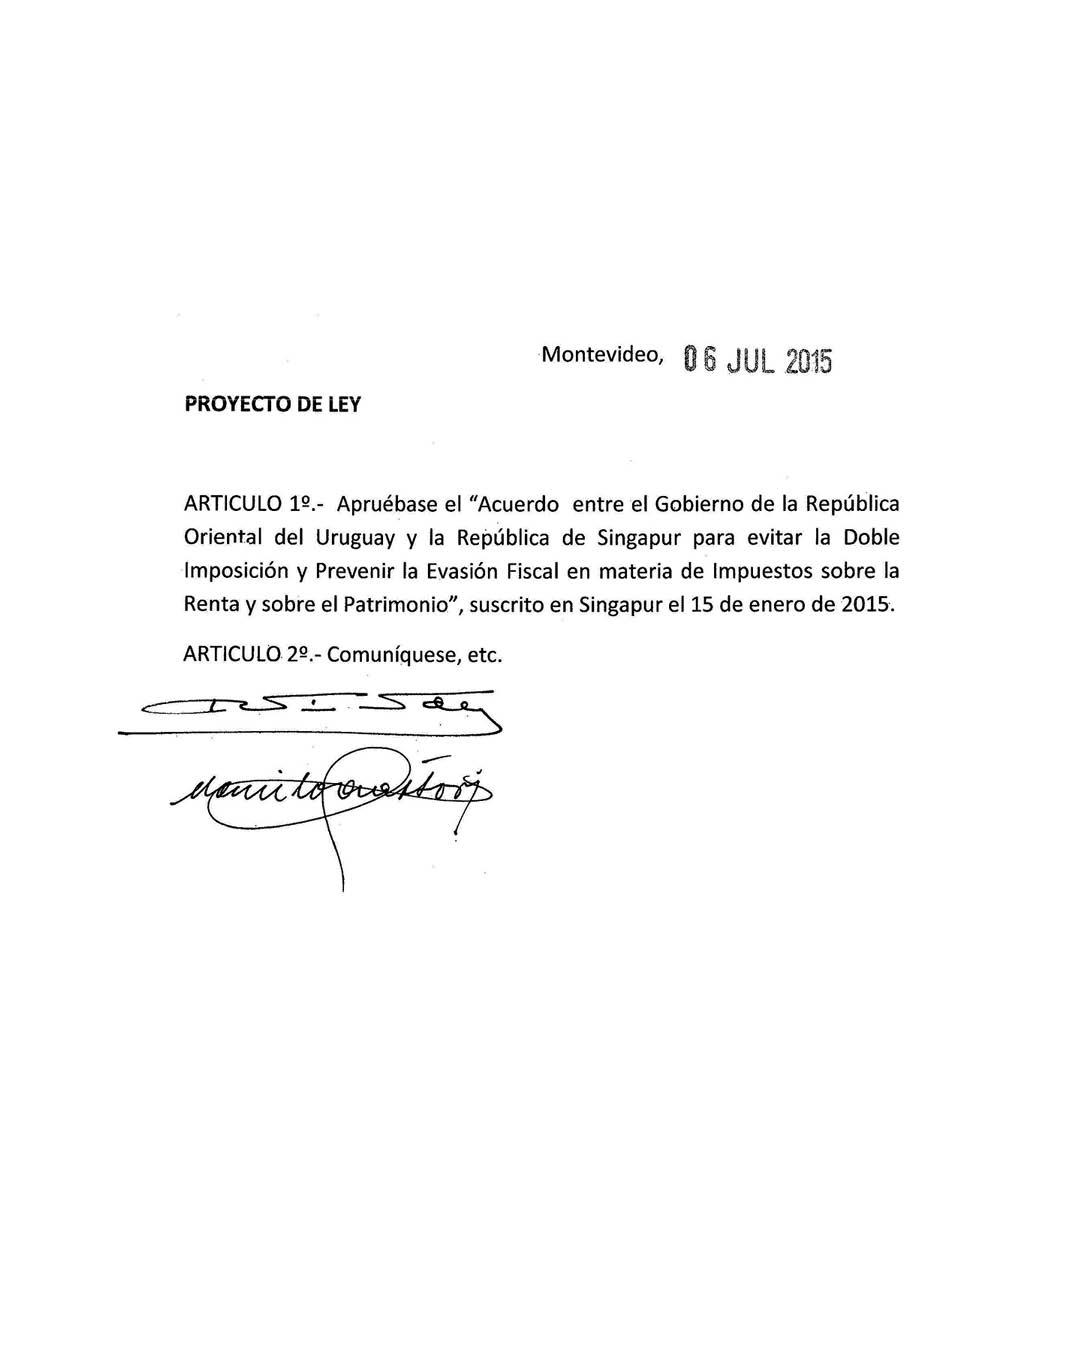 Dorable Asistente Administrativo Reanudar Muestra 2014 Ideas ...